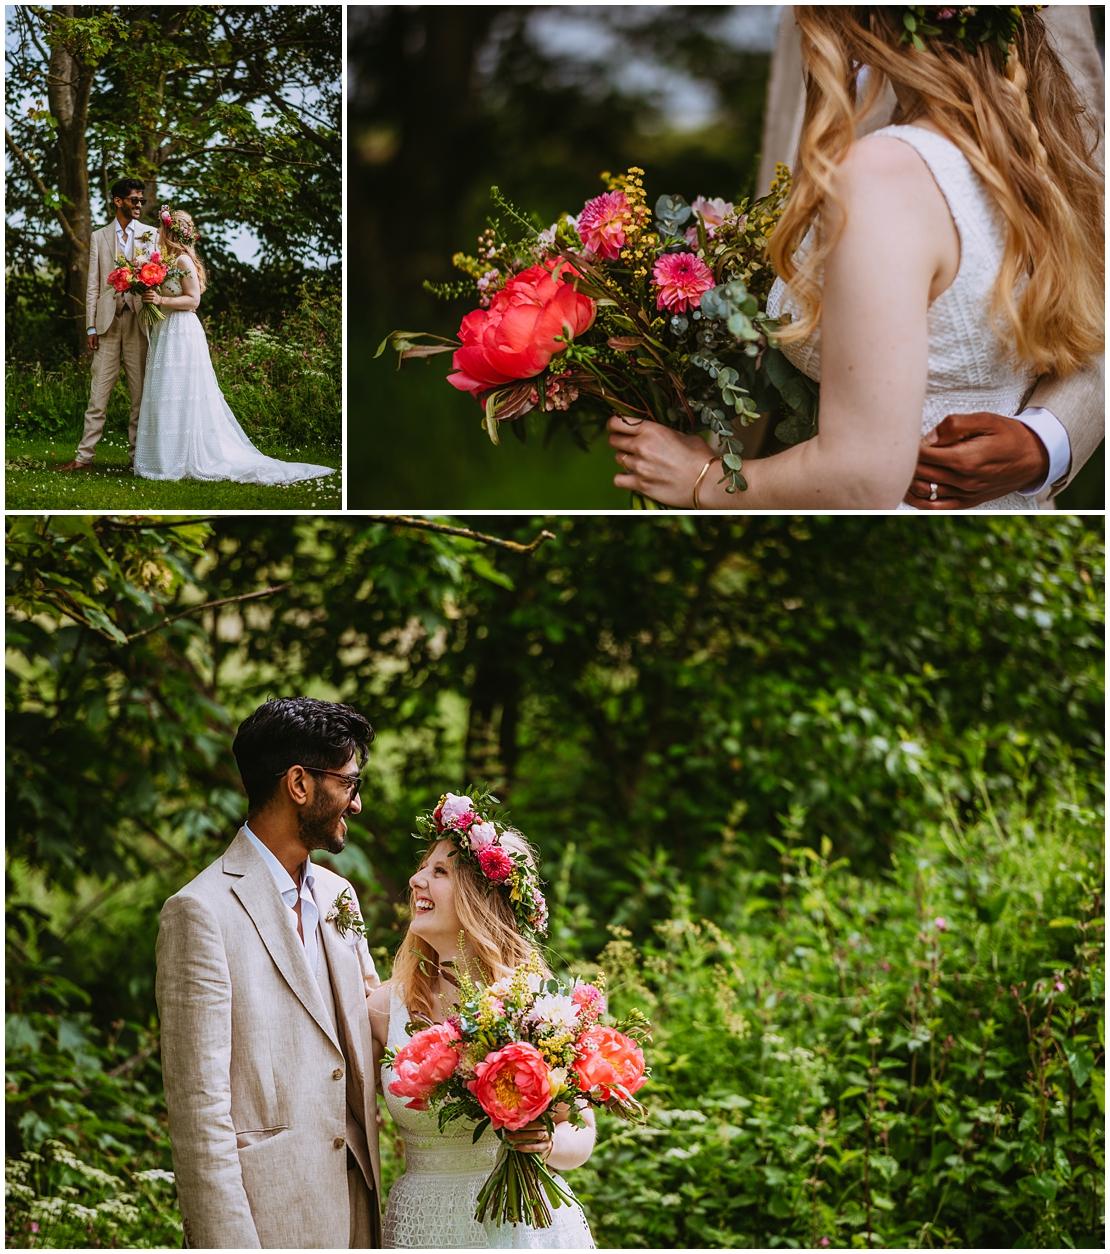 doxford barns wedding photography katie vivek 0060